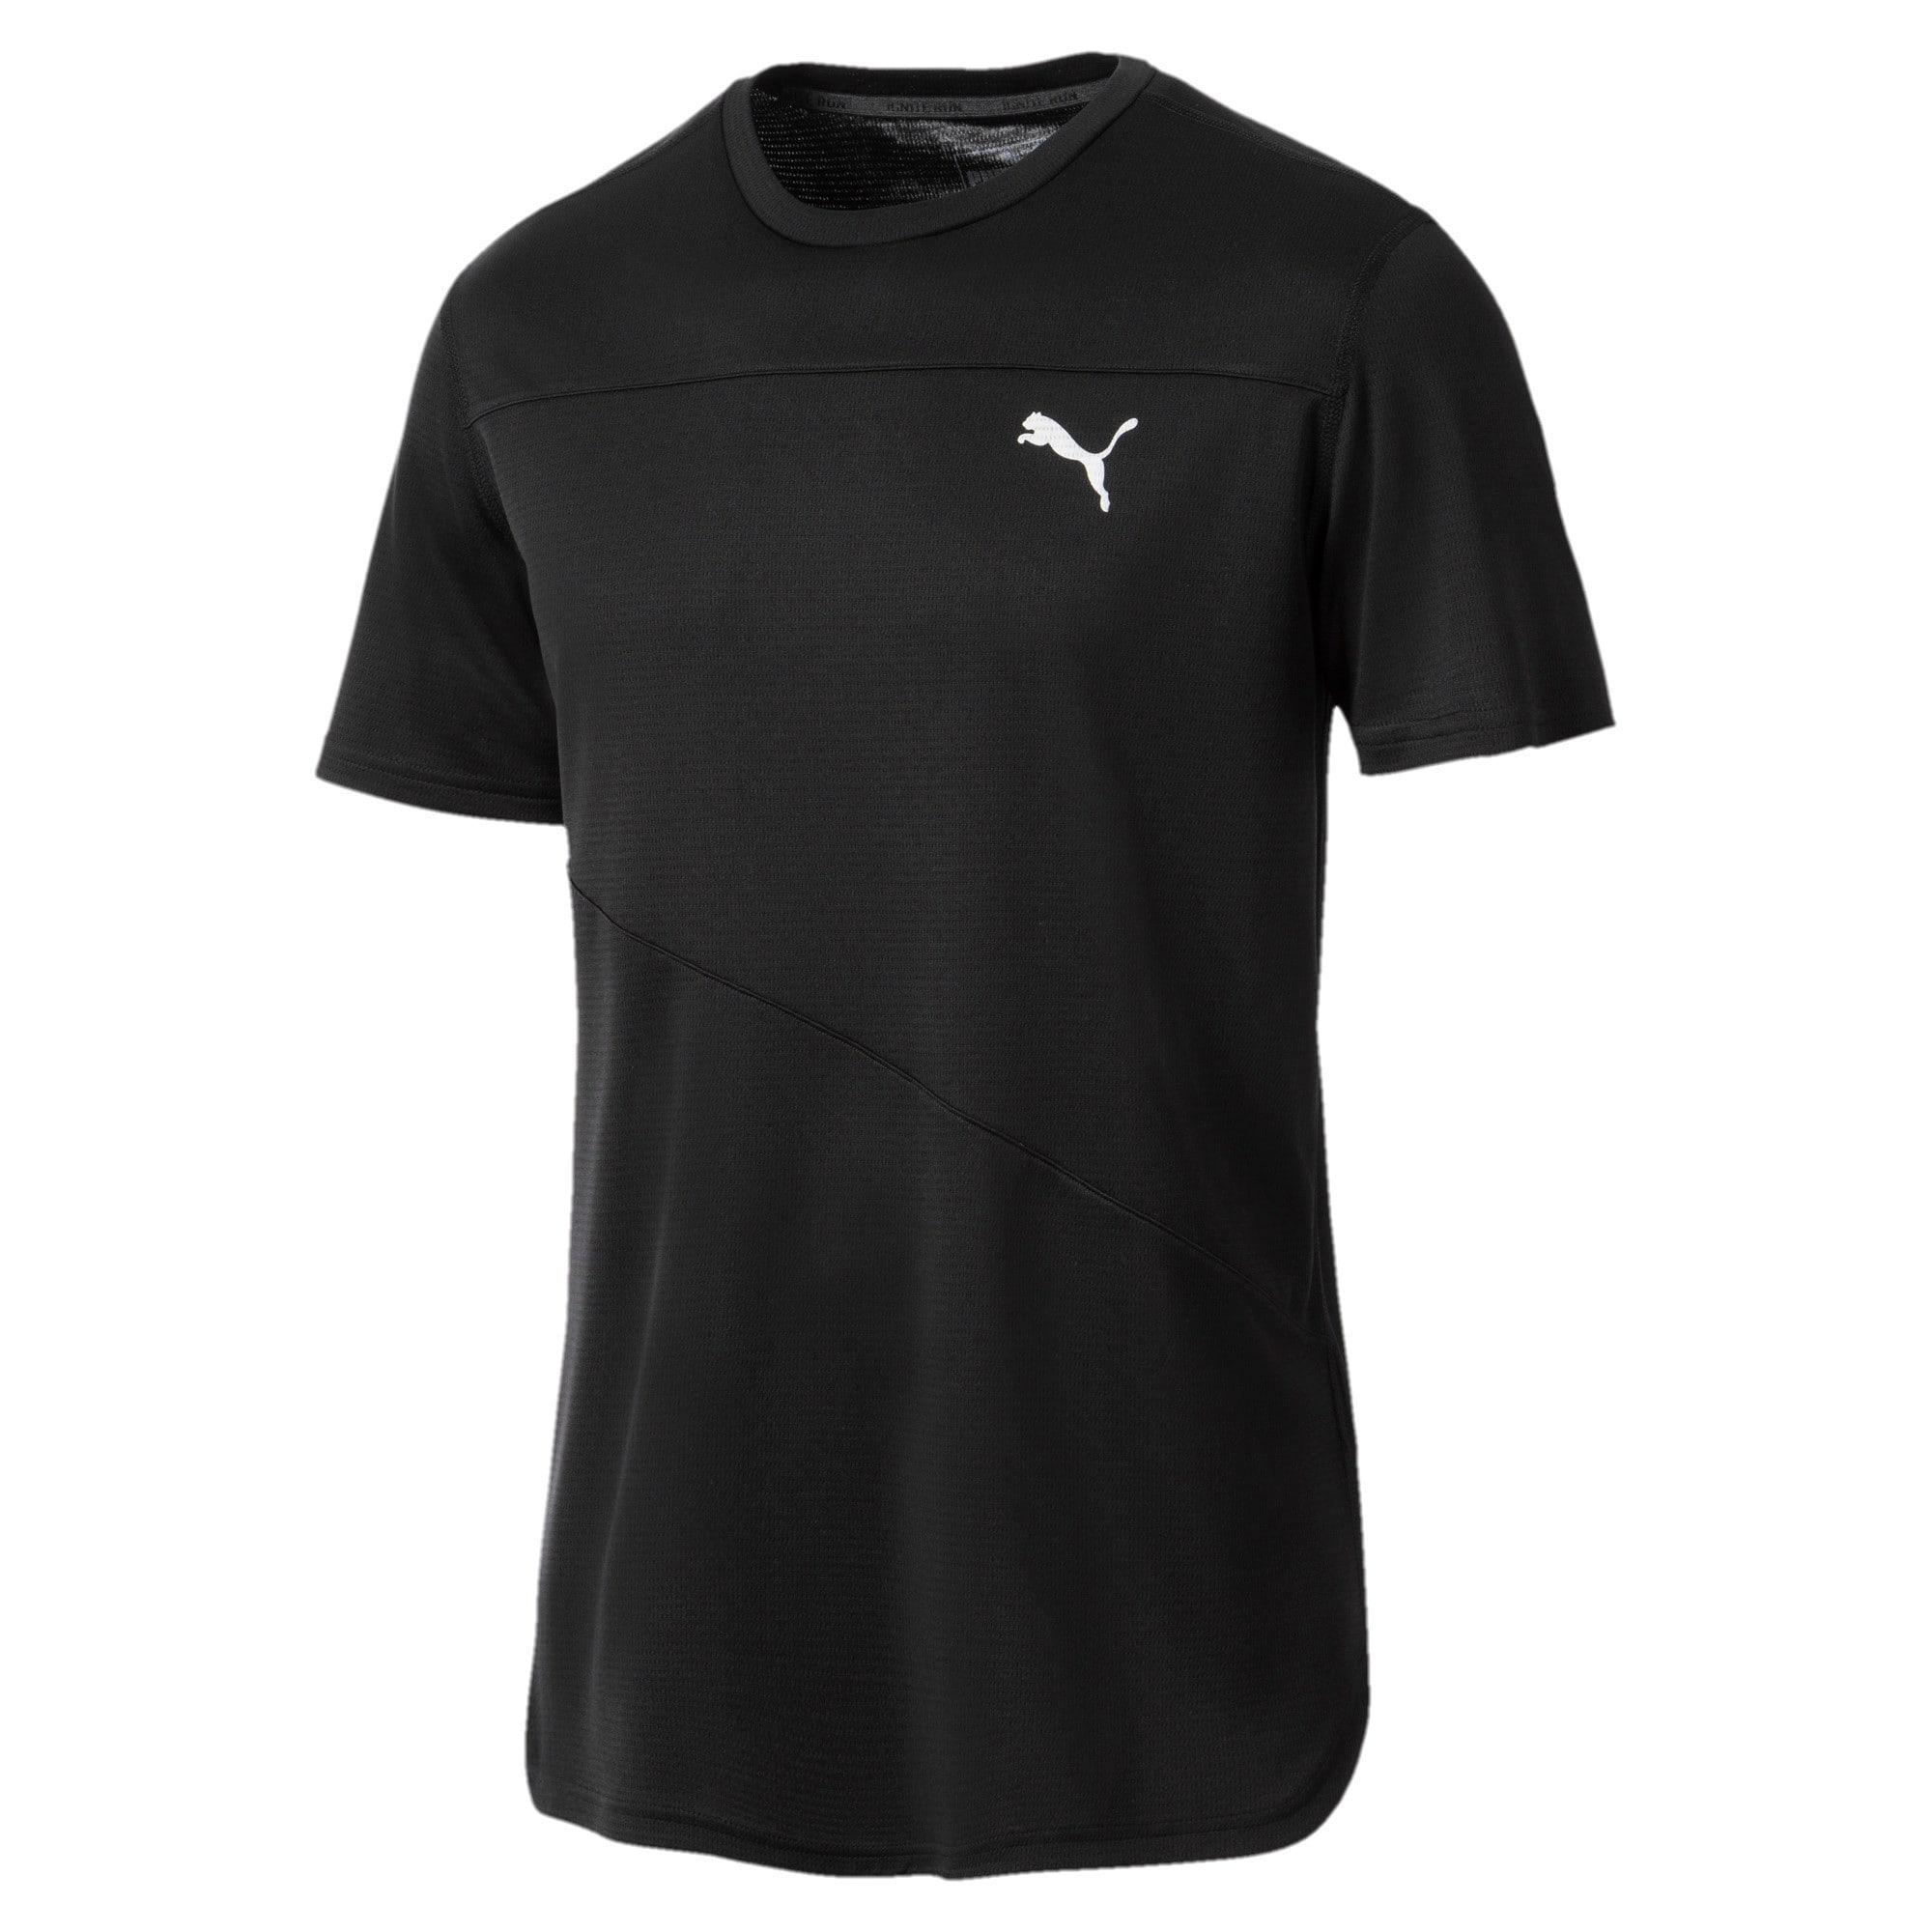 Thumbnail 2 of Running Men's IGNITE Mono T-Shirt, Puma Black, medium-IND